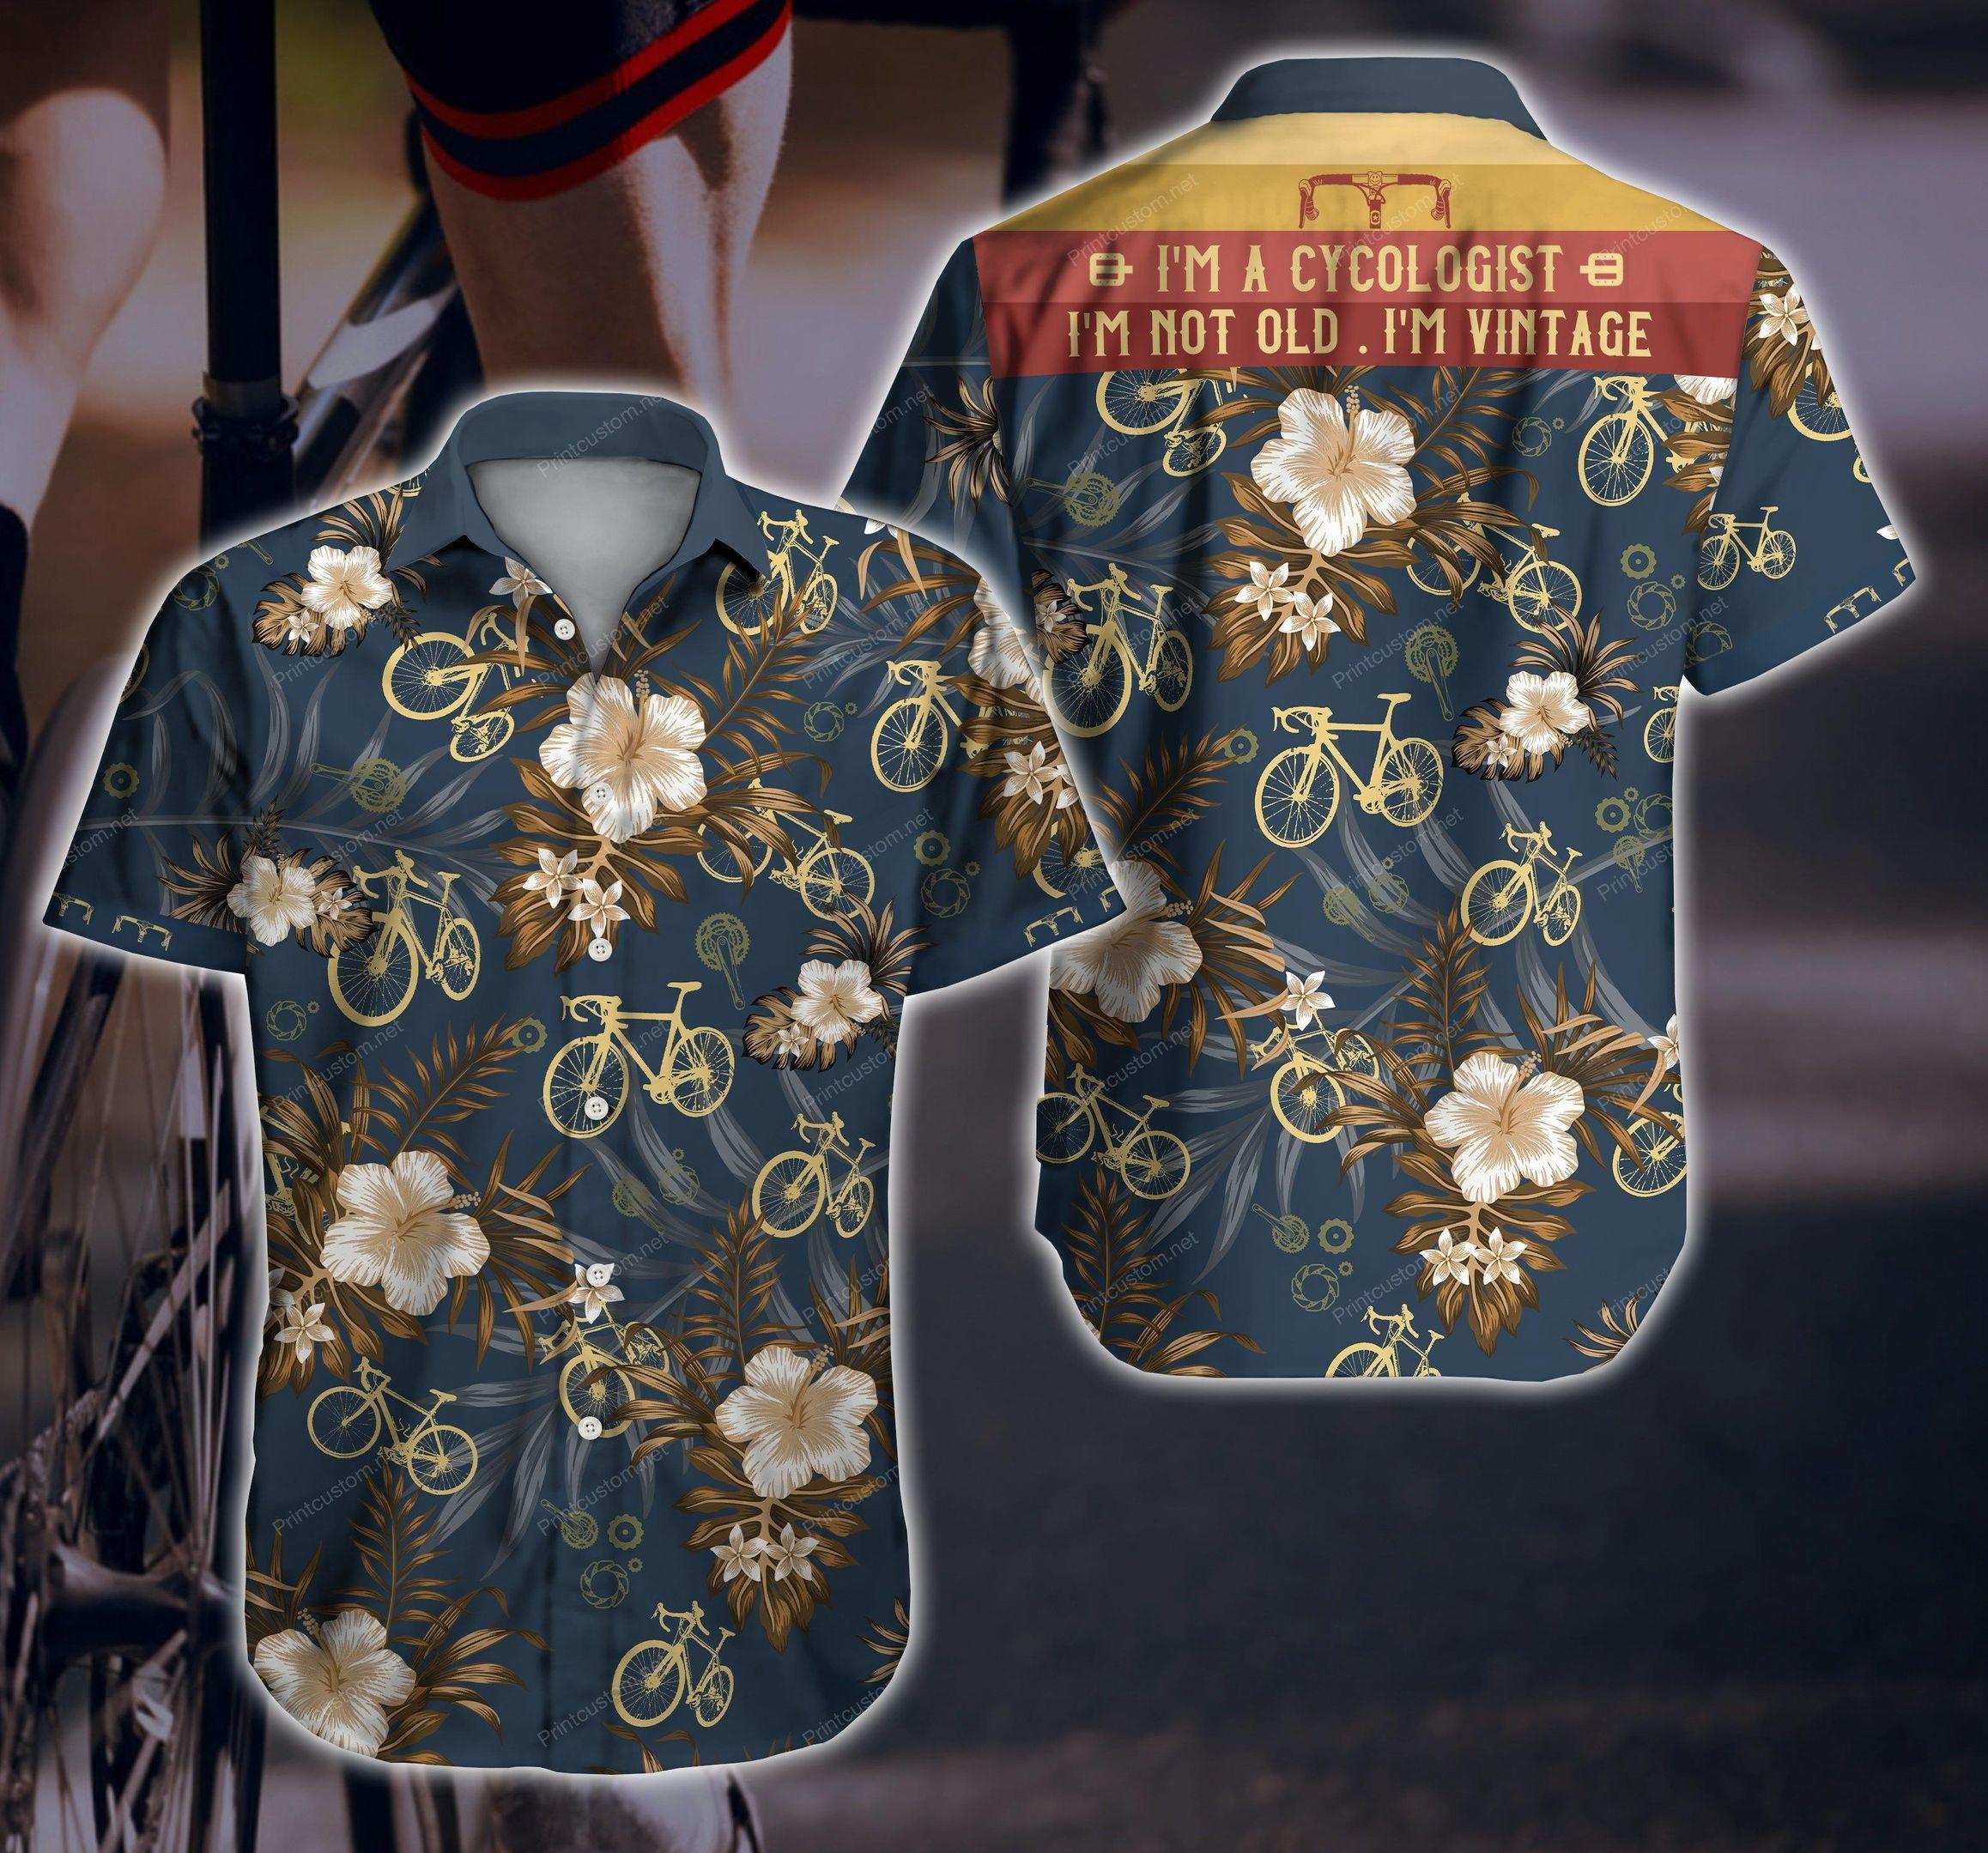 Cycologist Vintage Bicycle Floral Hawaiian Shirt